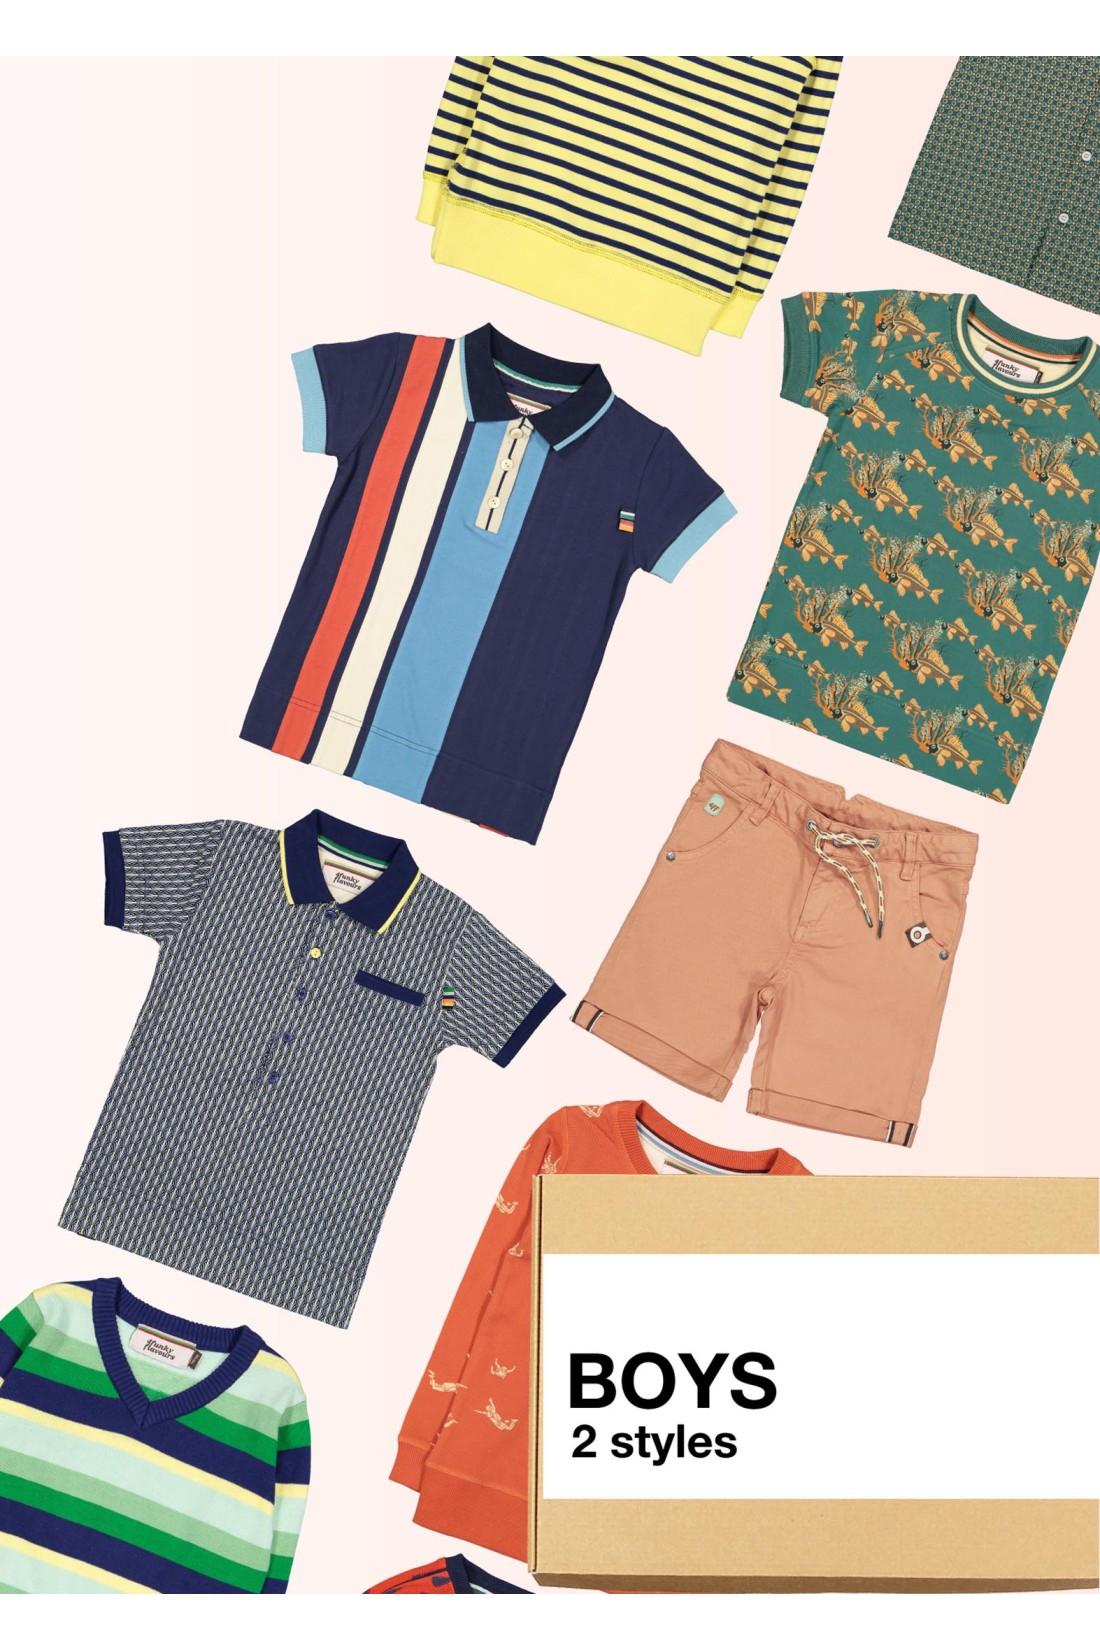 Surprise Box Boy - 2 Styles